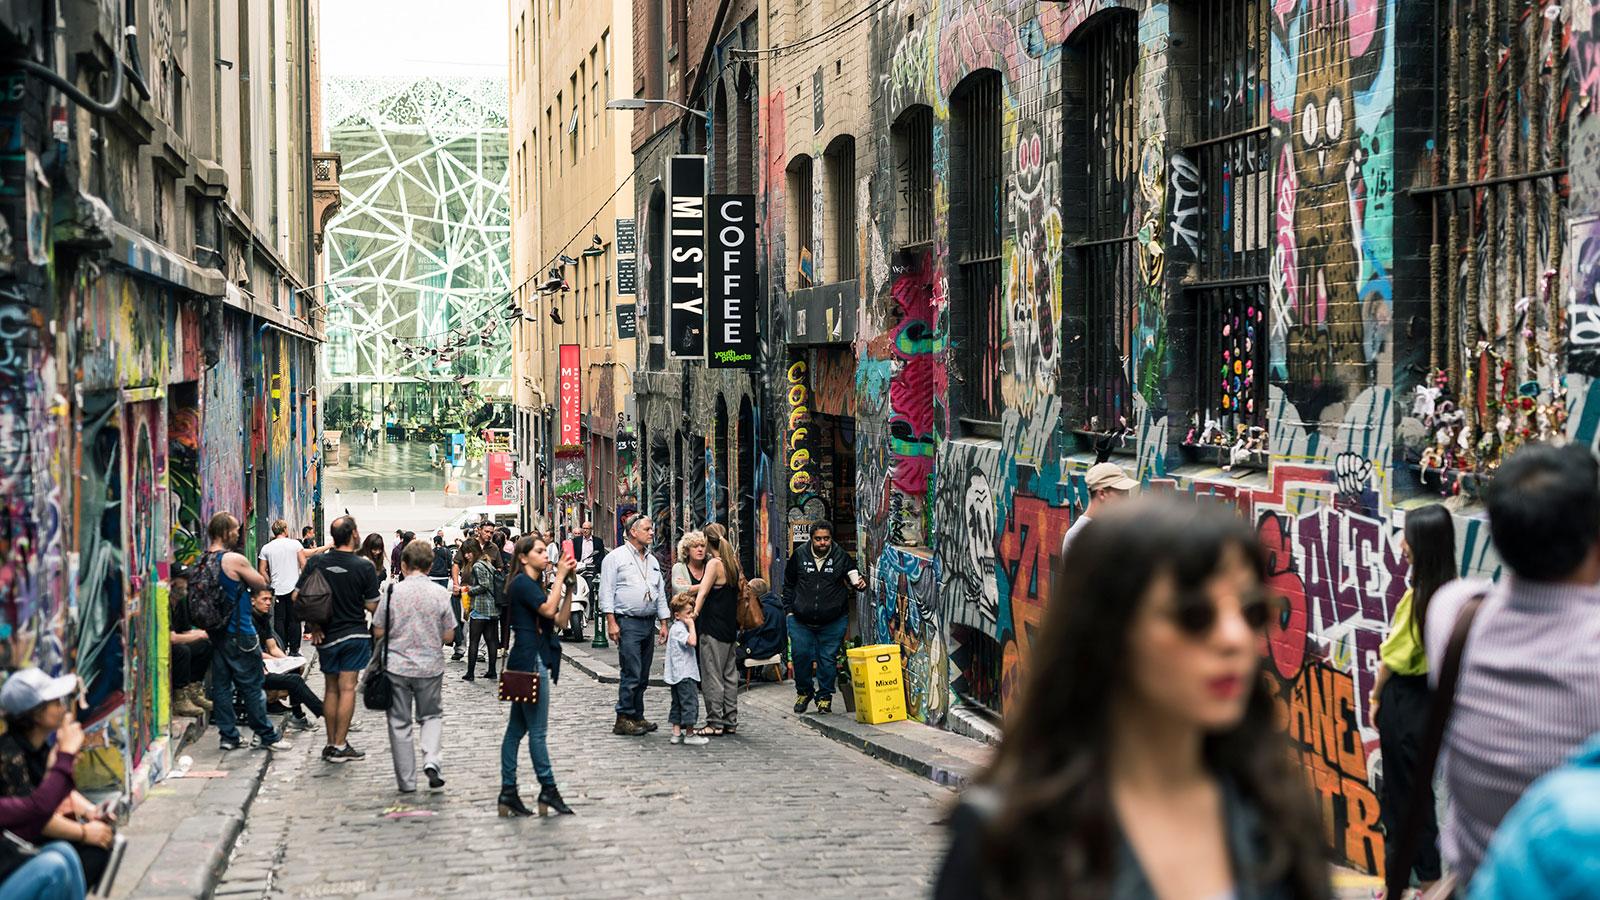 Image from Visit Melbourne